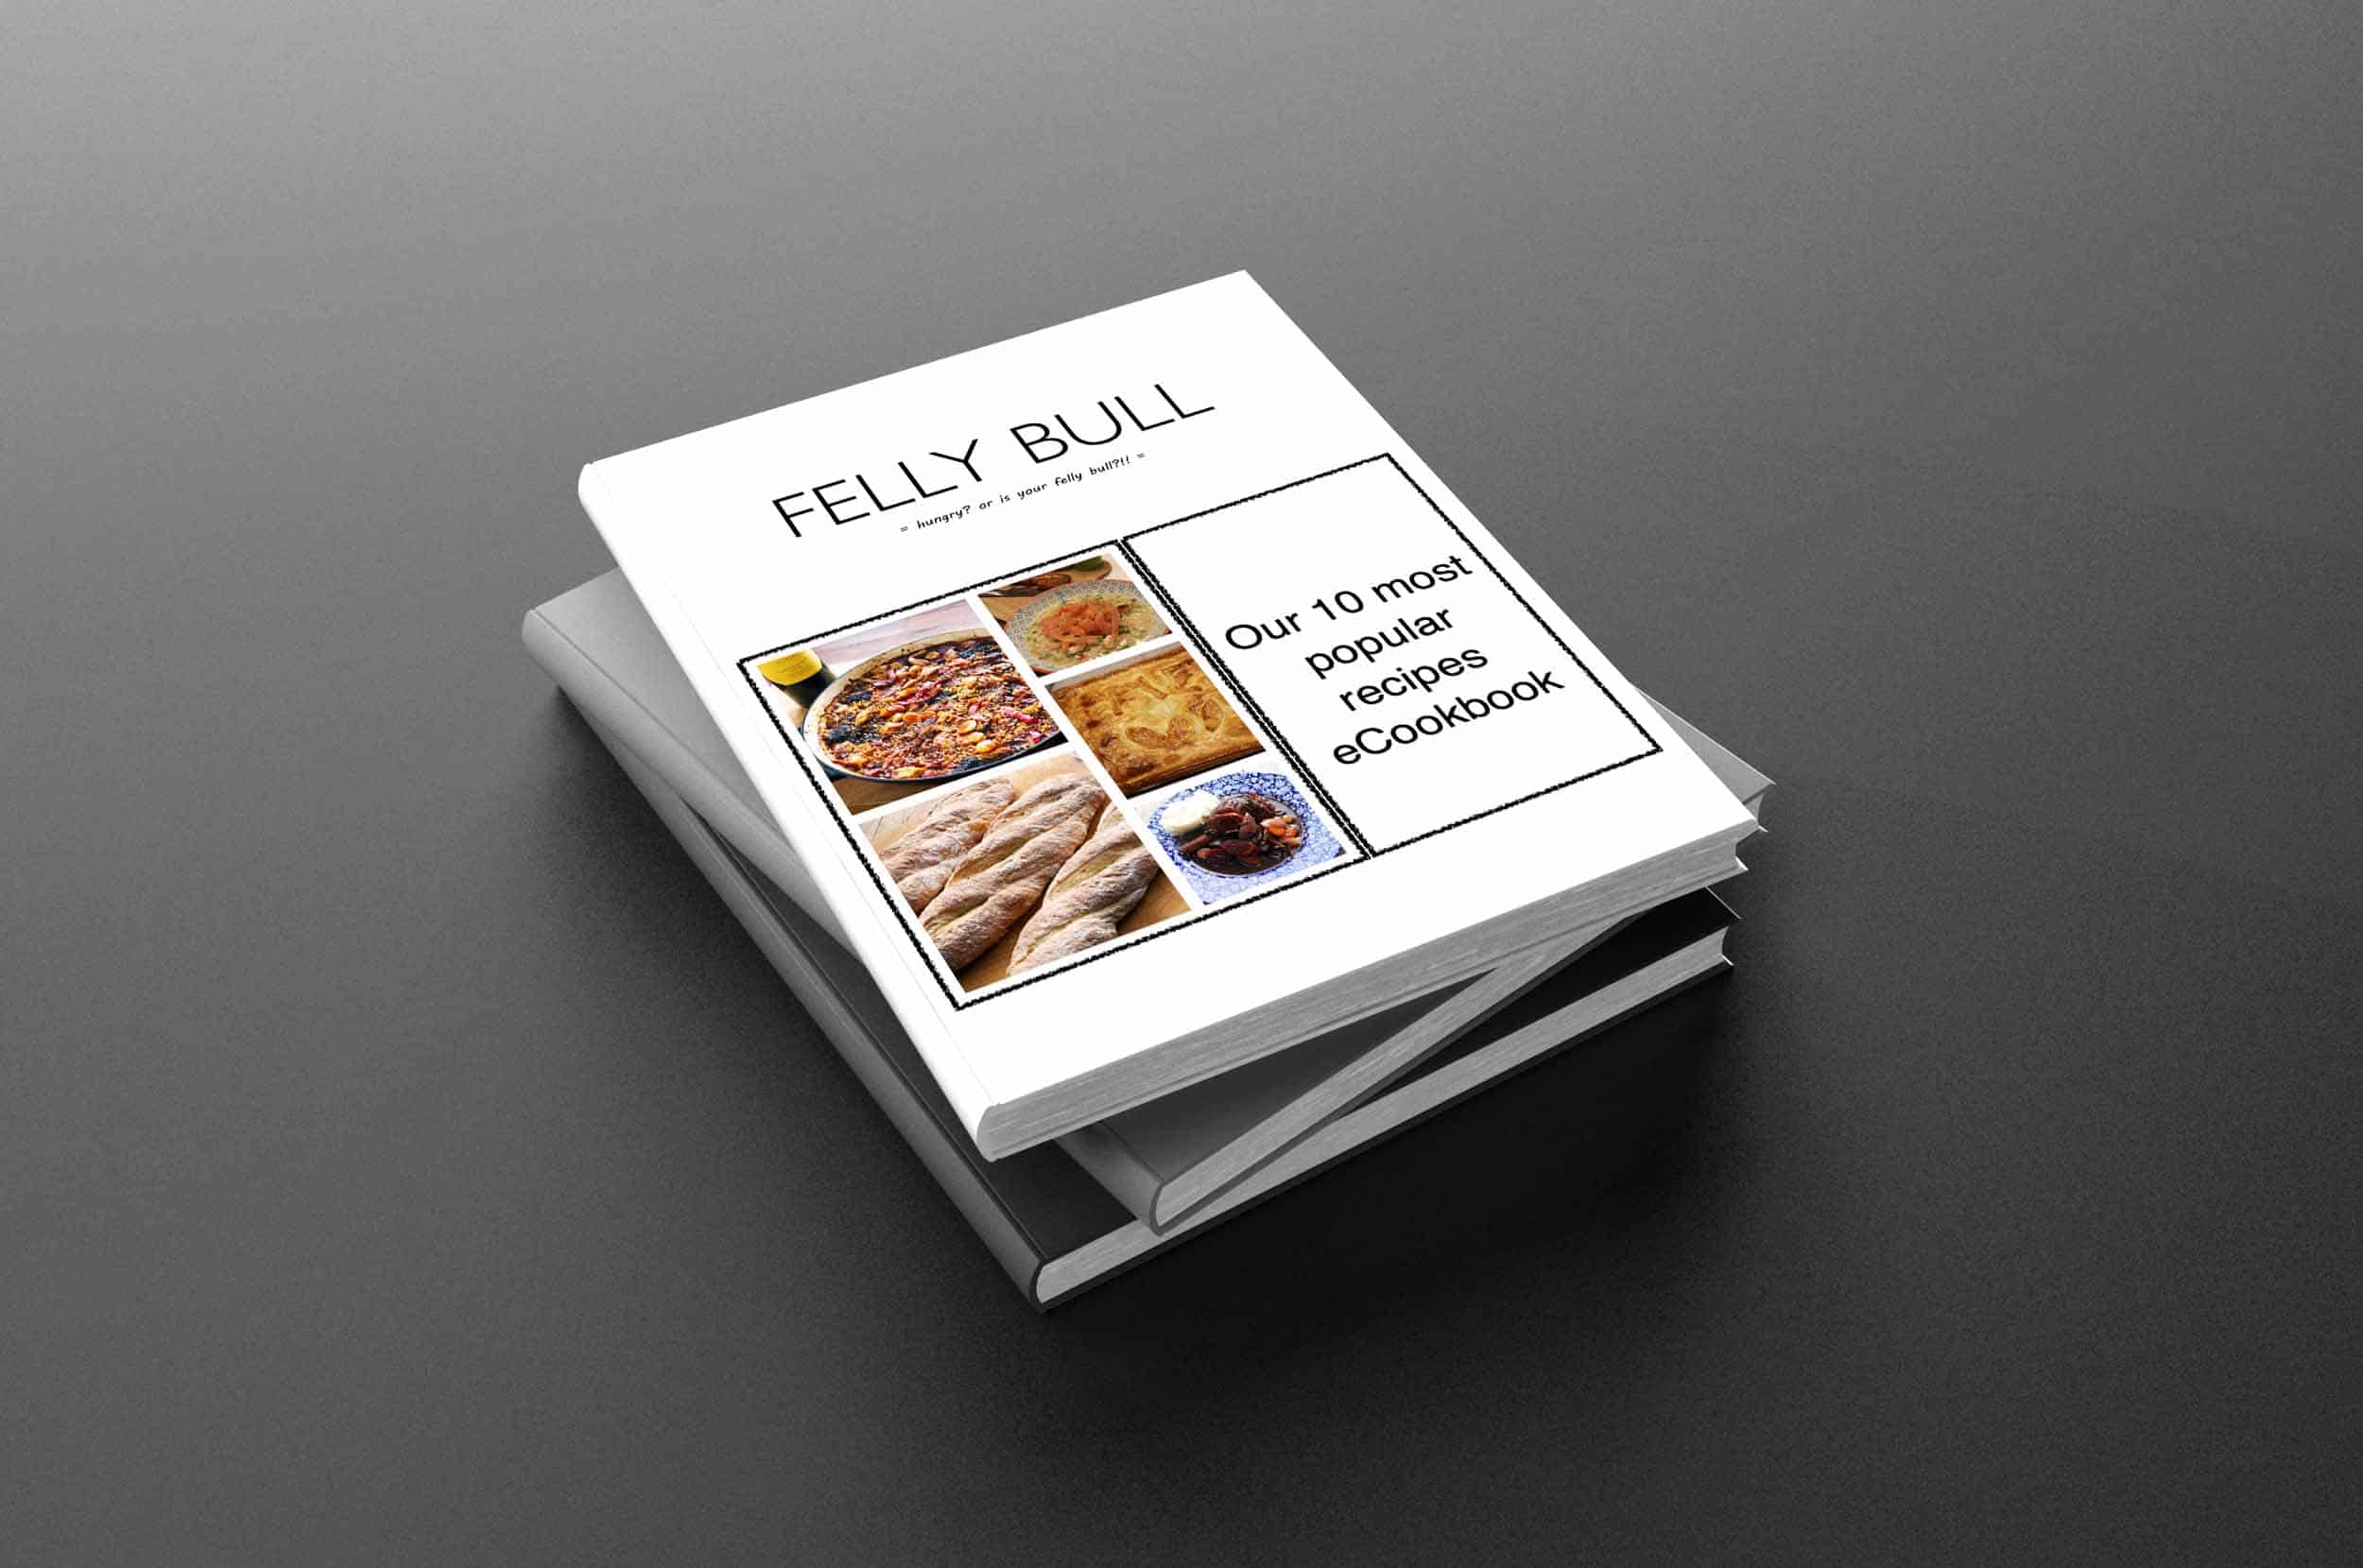 Free eCookbook, Free subscription and eCookbook